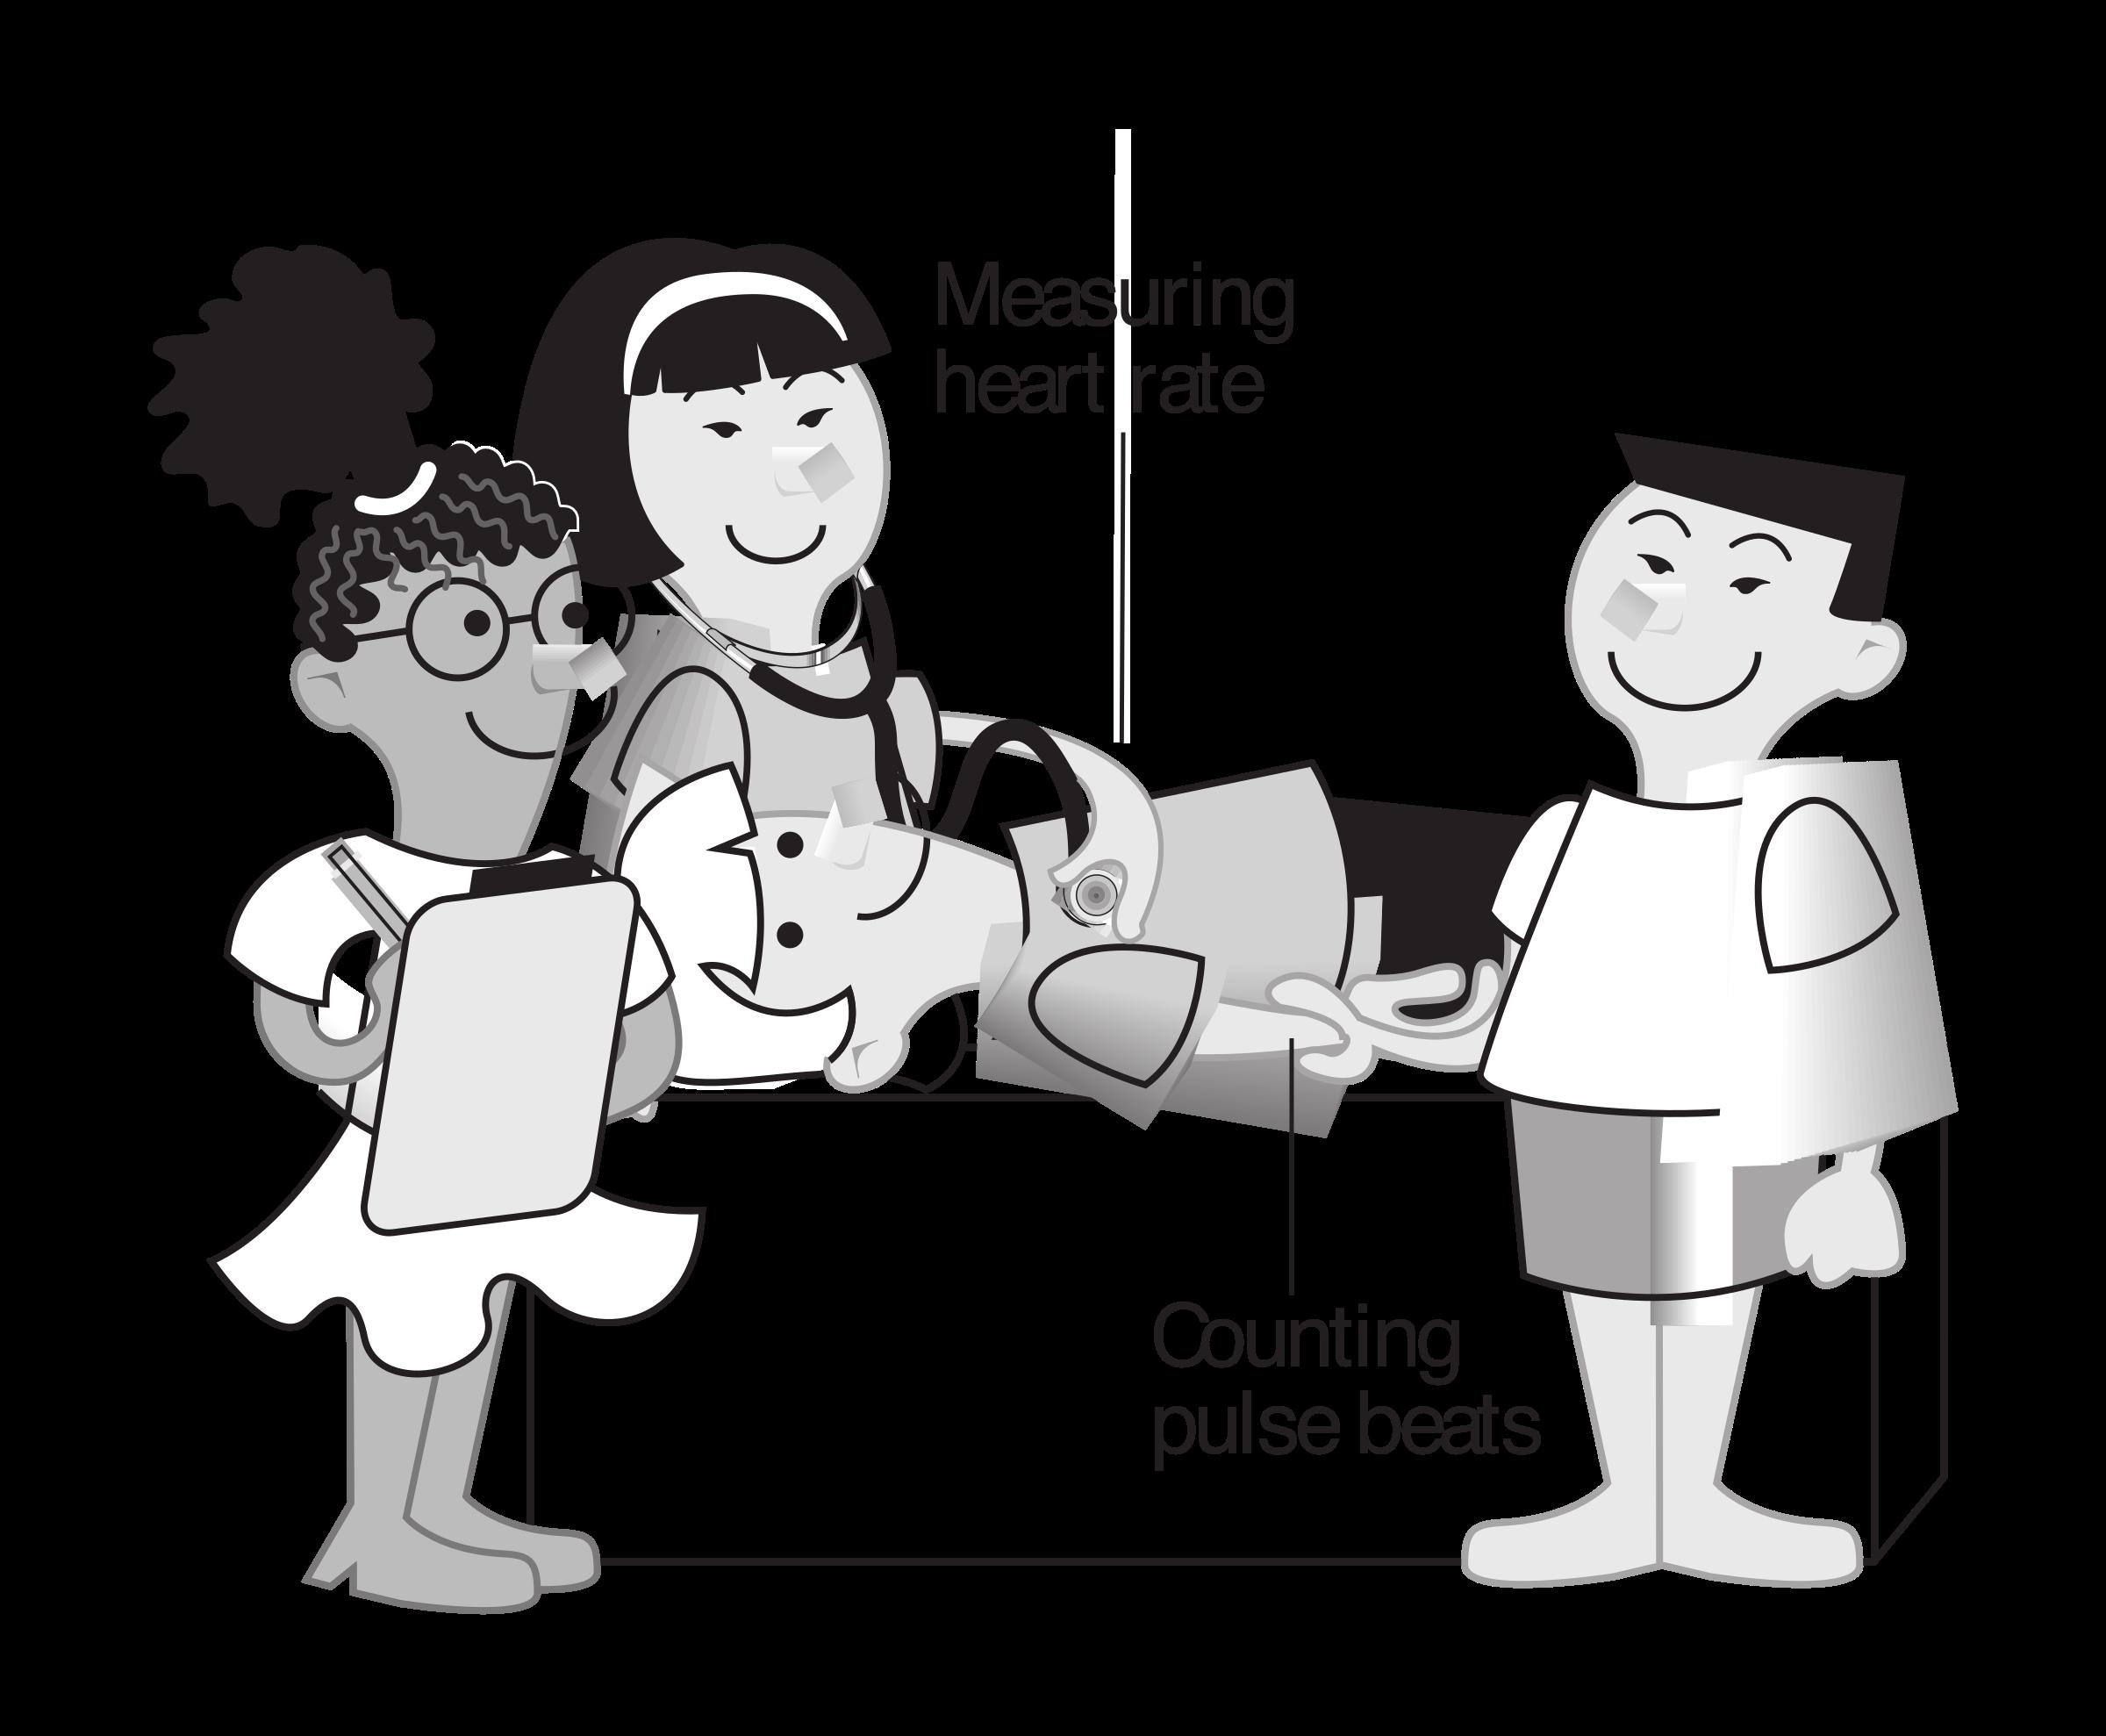 Nursing clipart interaction. Kids measuring heart rate